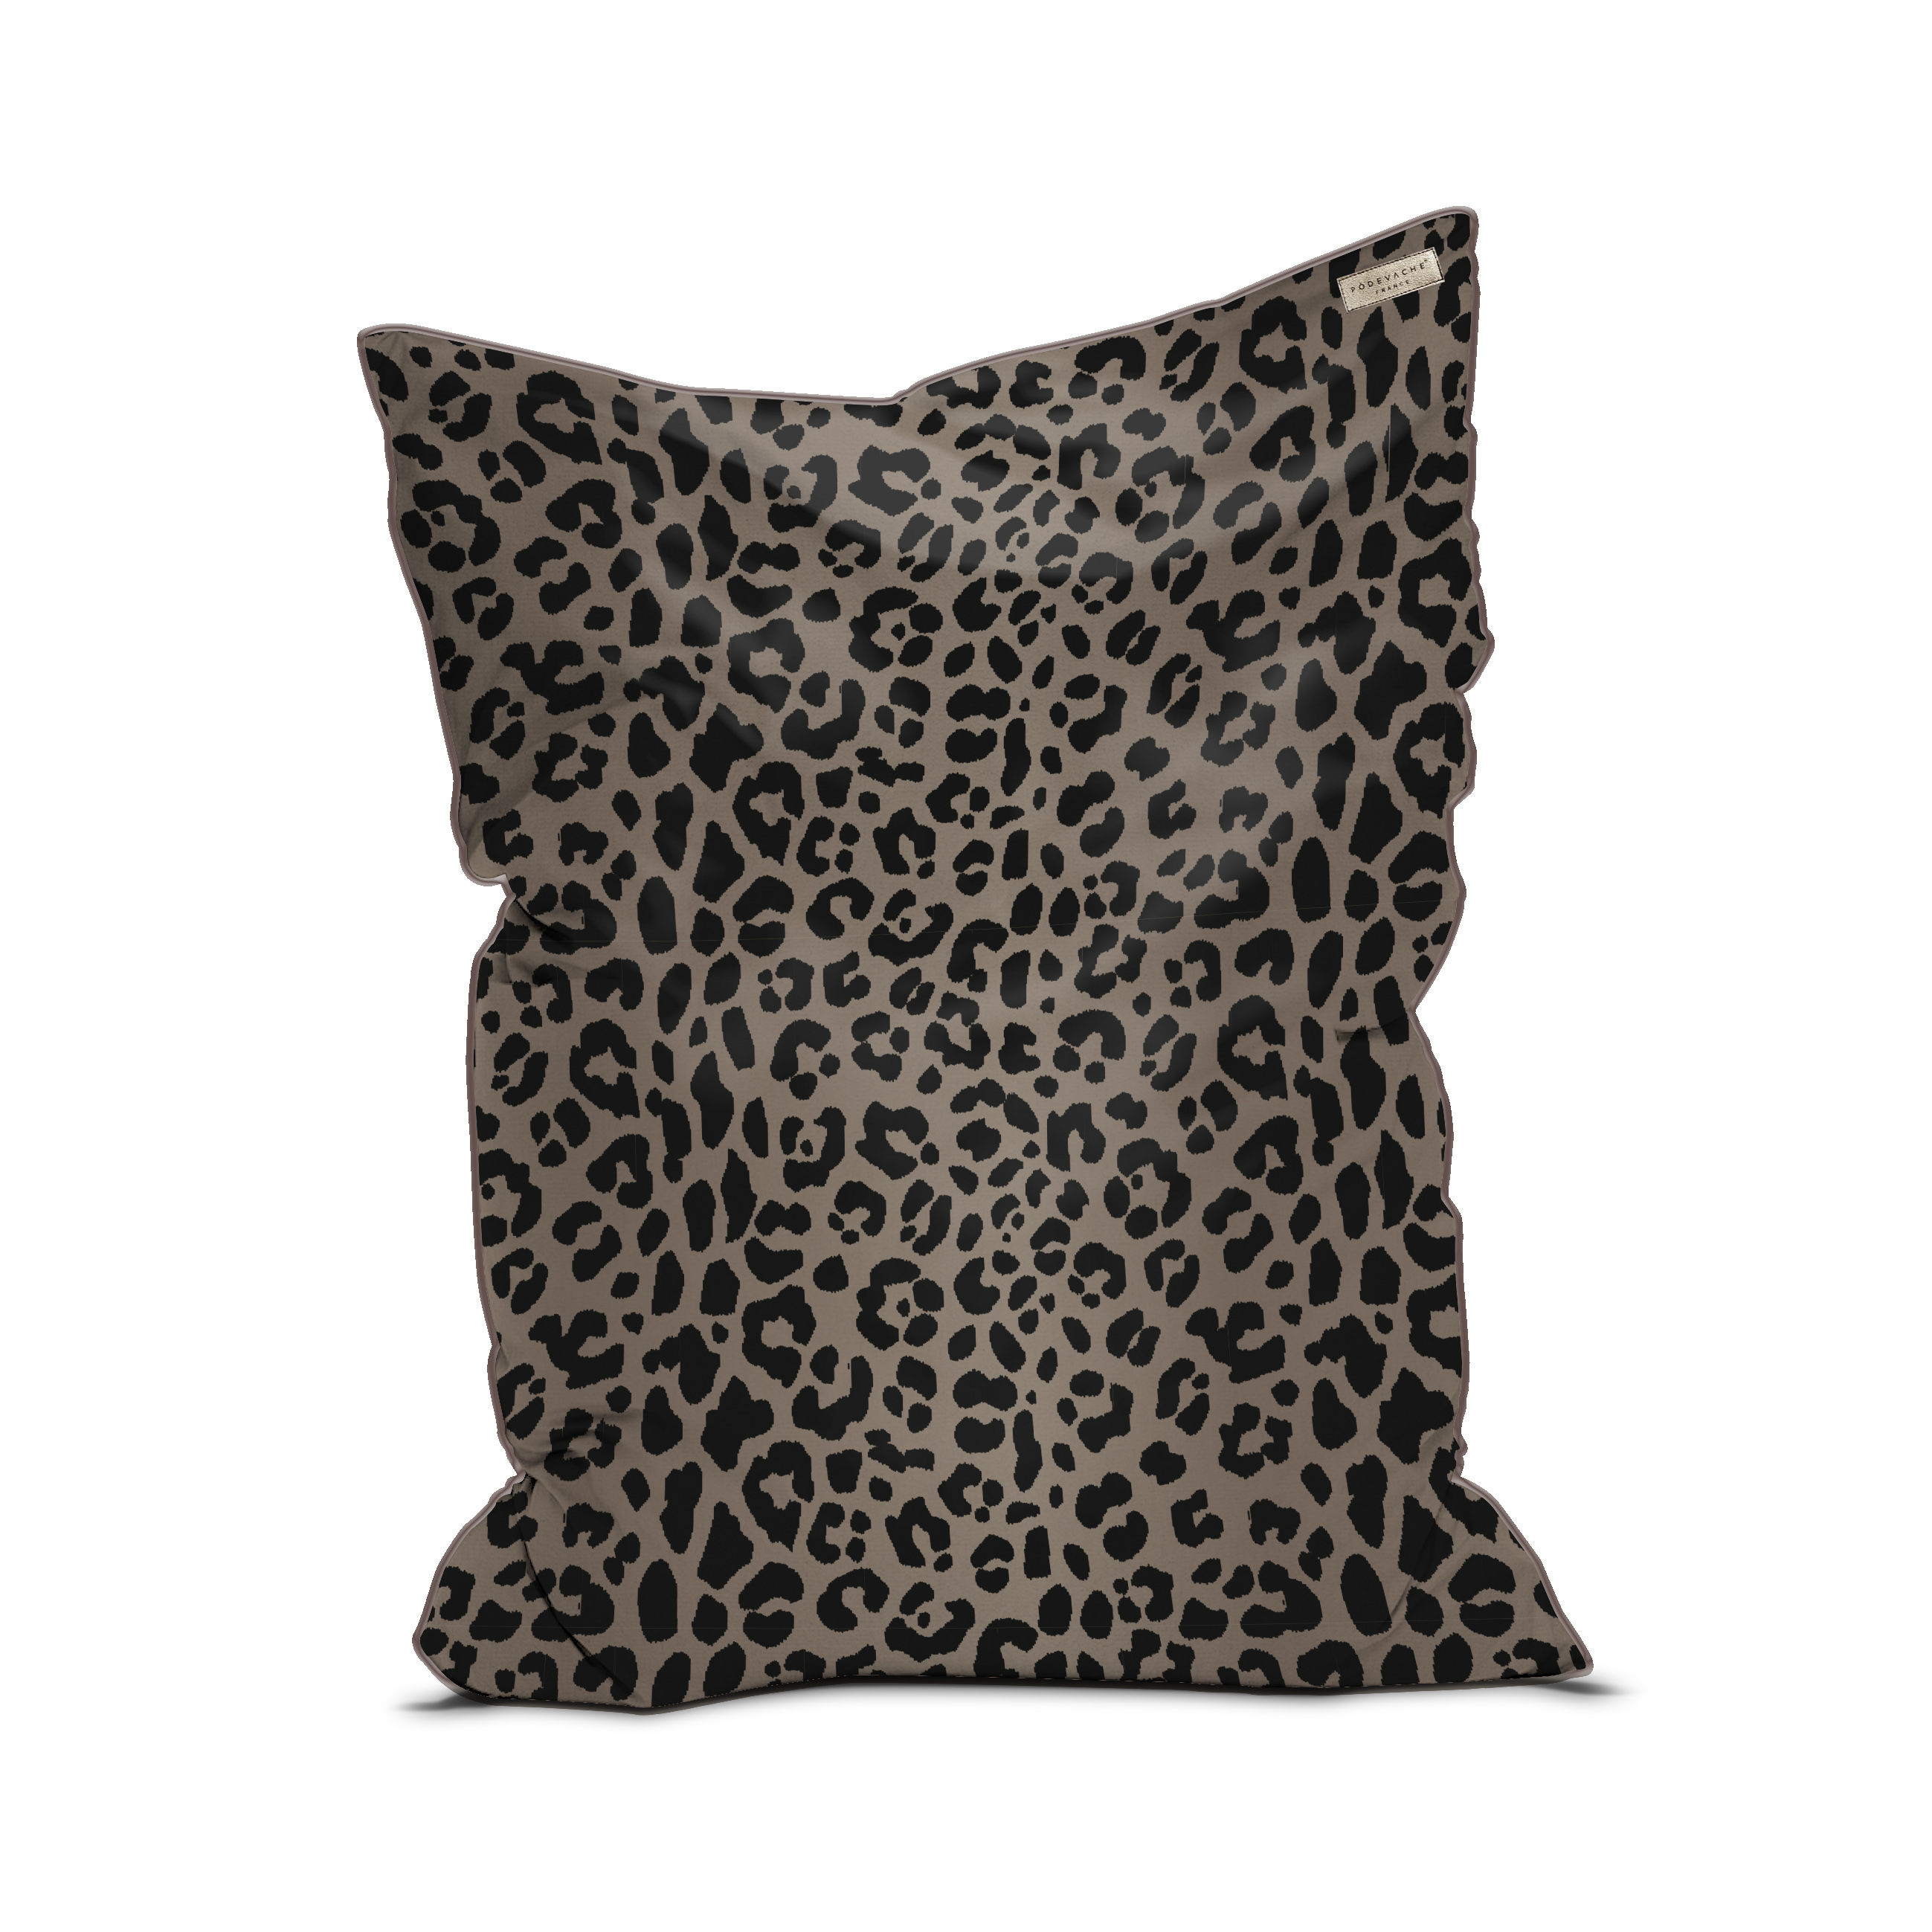 Furniture - Poufs & Floor Cushions - Out Of Africa Pouf - / Velvet - 115 x 145 cm by PÔDEVACHE - Leopard - EPS balls, Fabric, Velvet